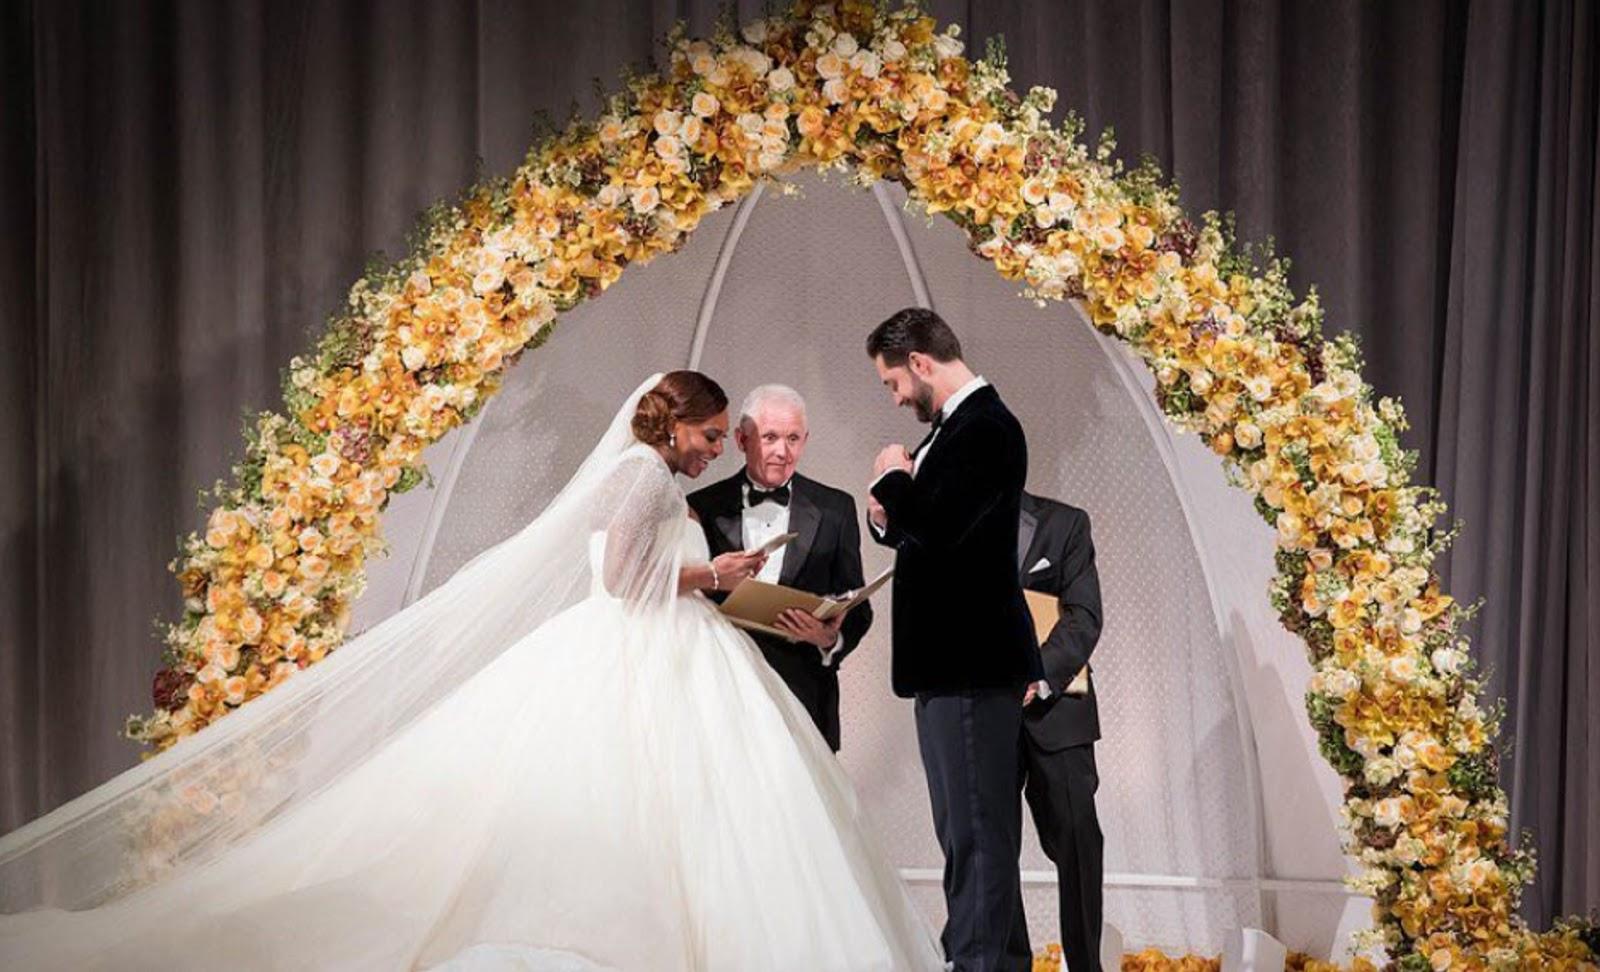 SERENA WILLIAMS, ALEXIS OHANIAN WEDDING 7